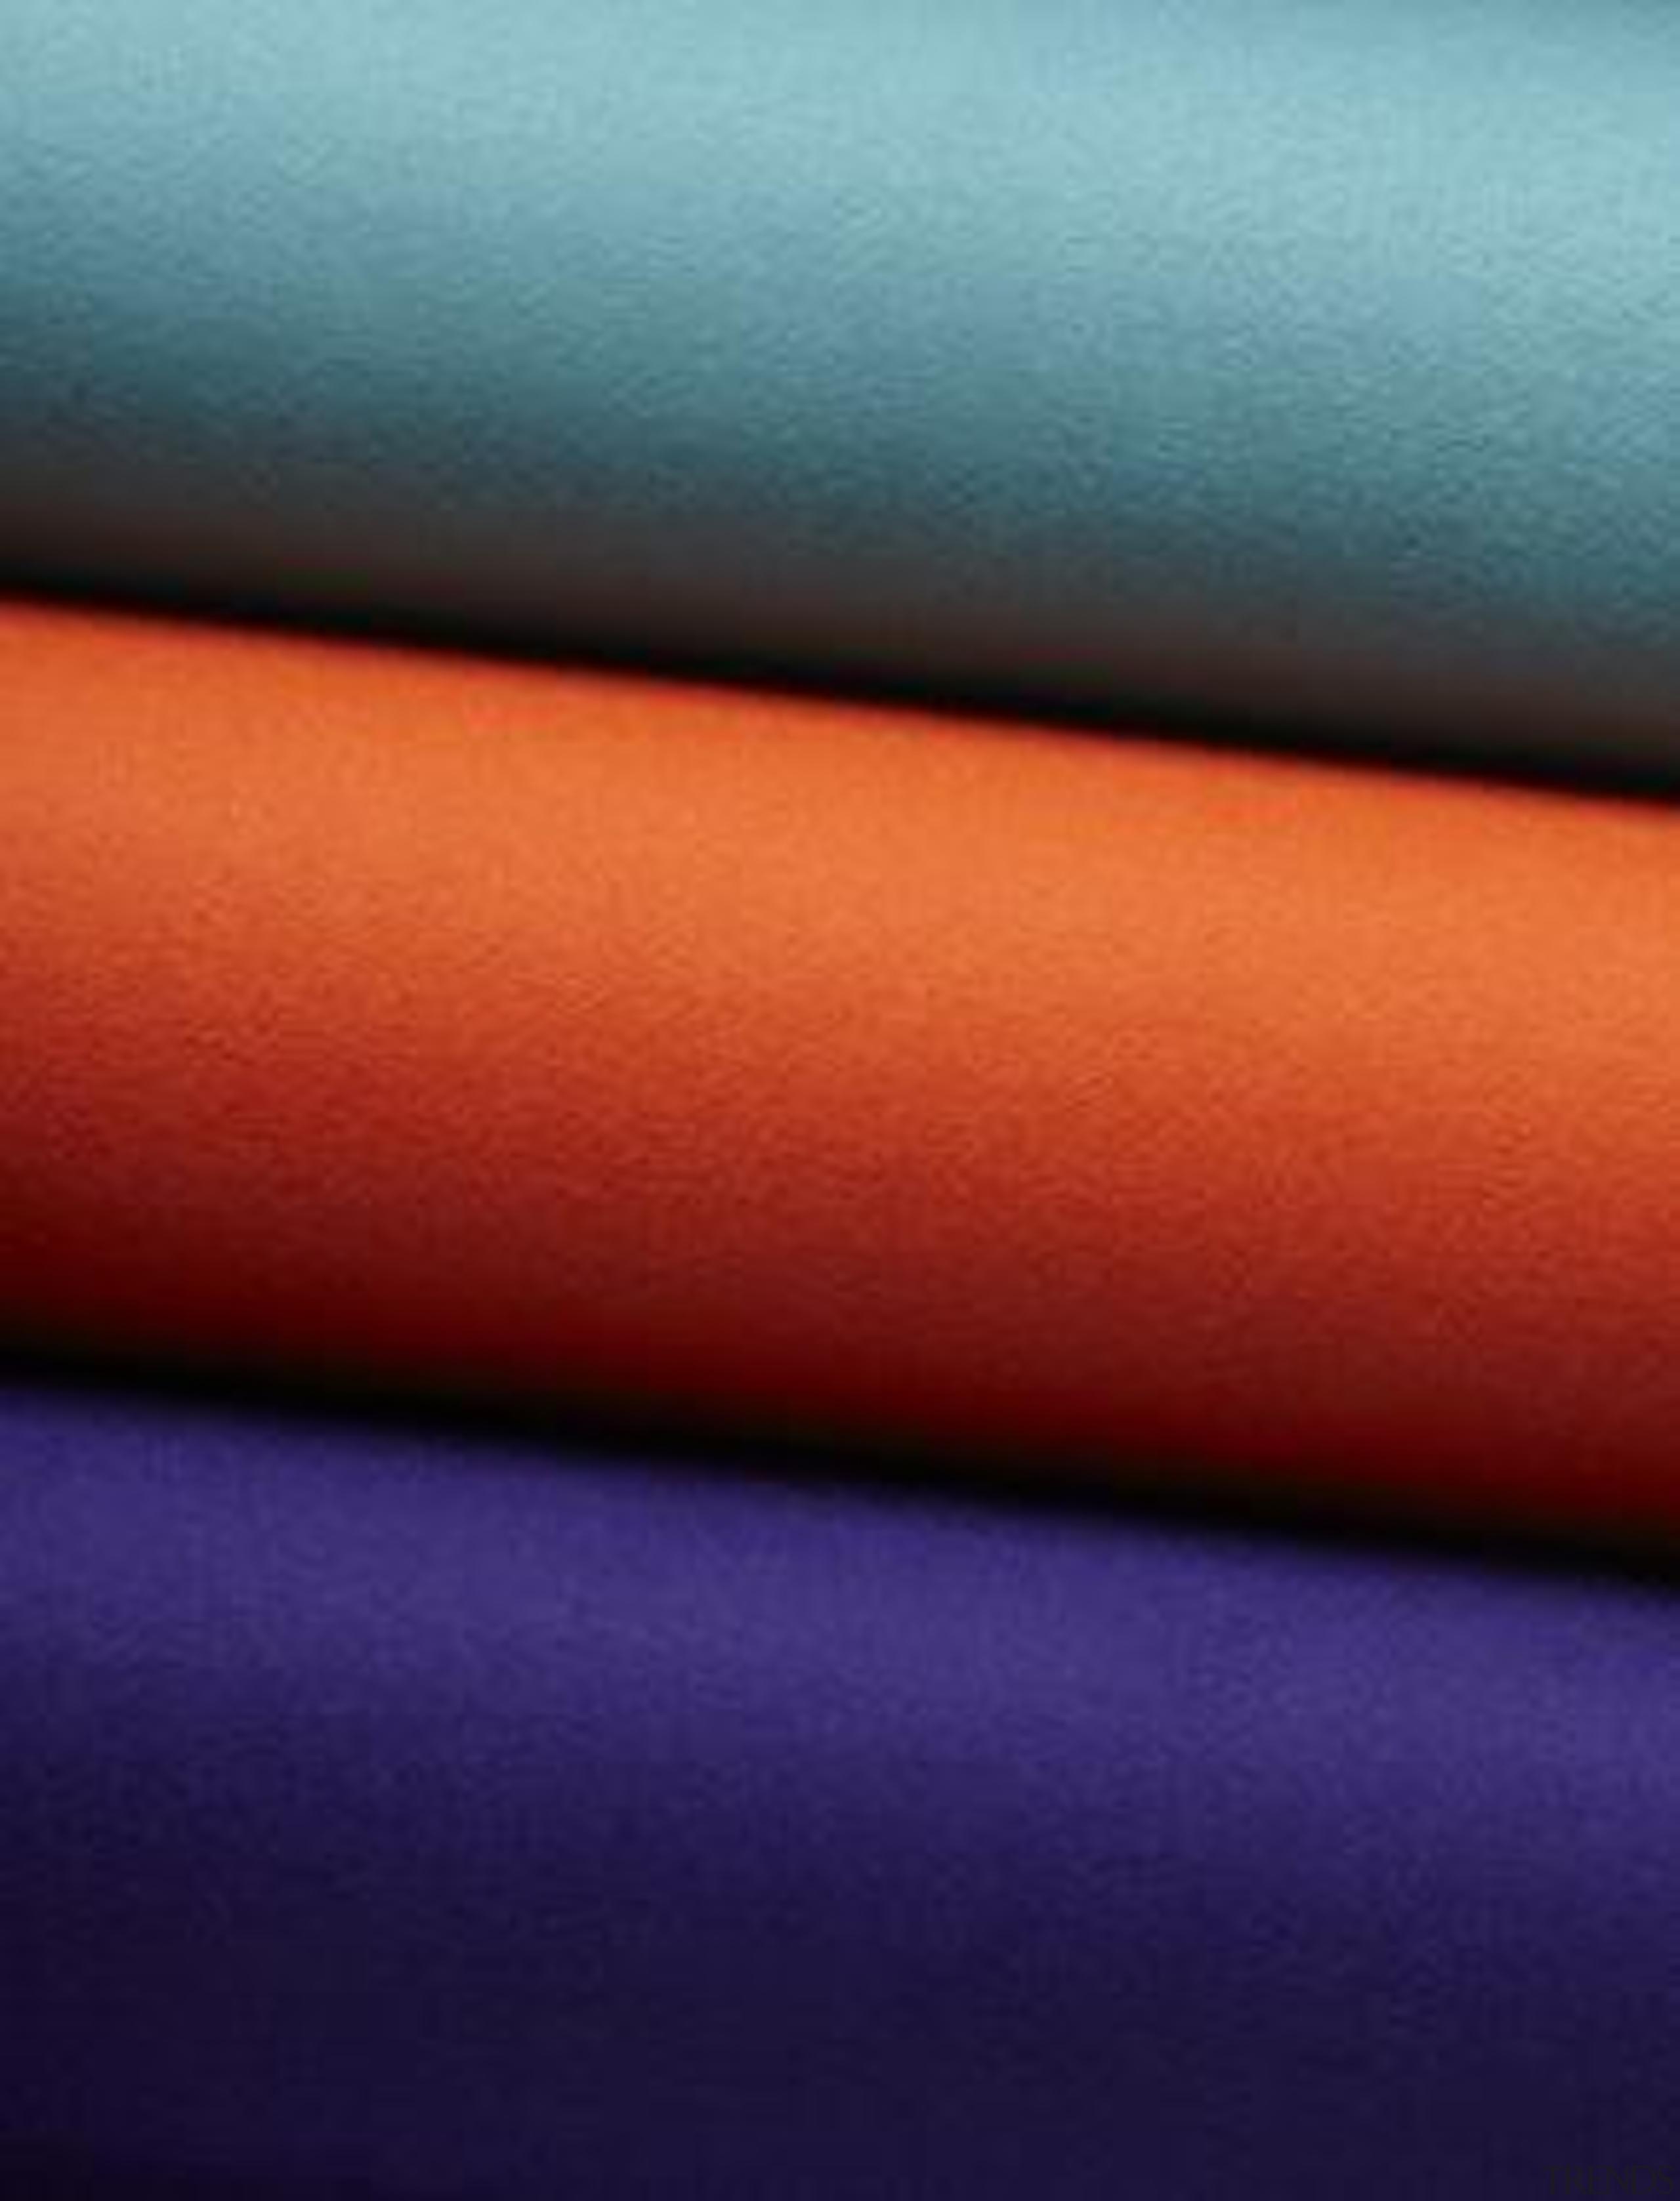 Cumulus - blue | close up | electric blue, close up, electric blue, material, orange, red, textile, red